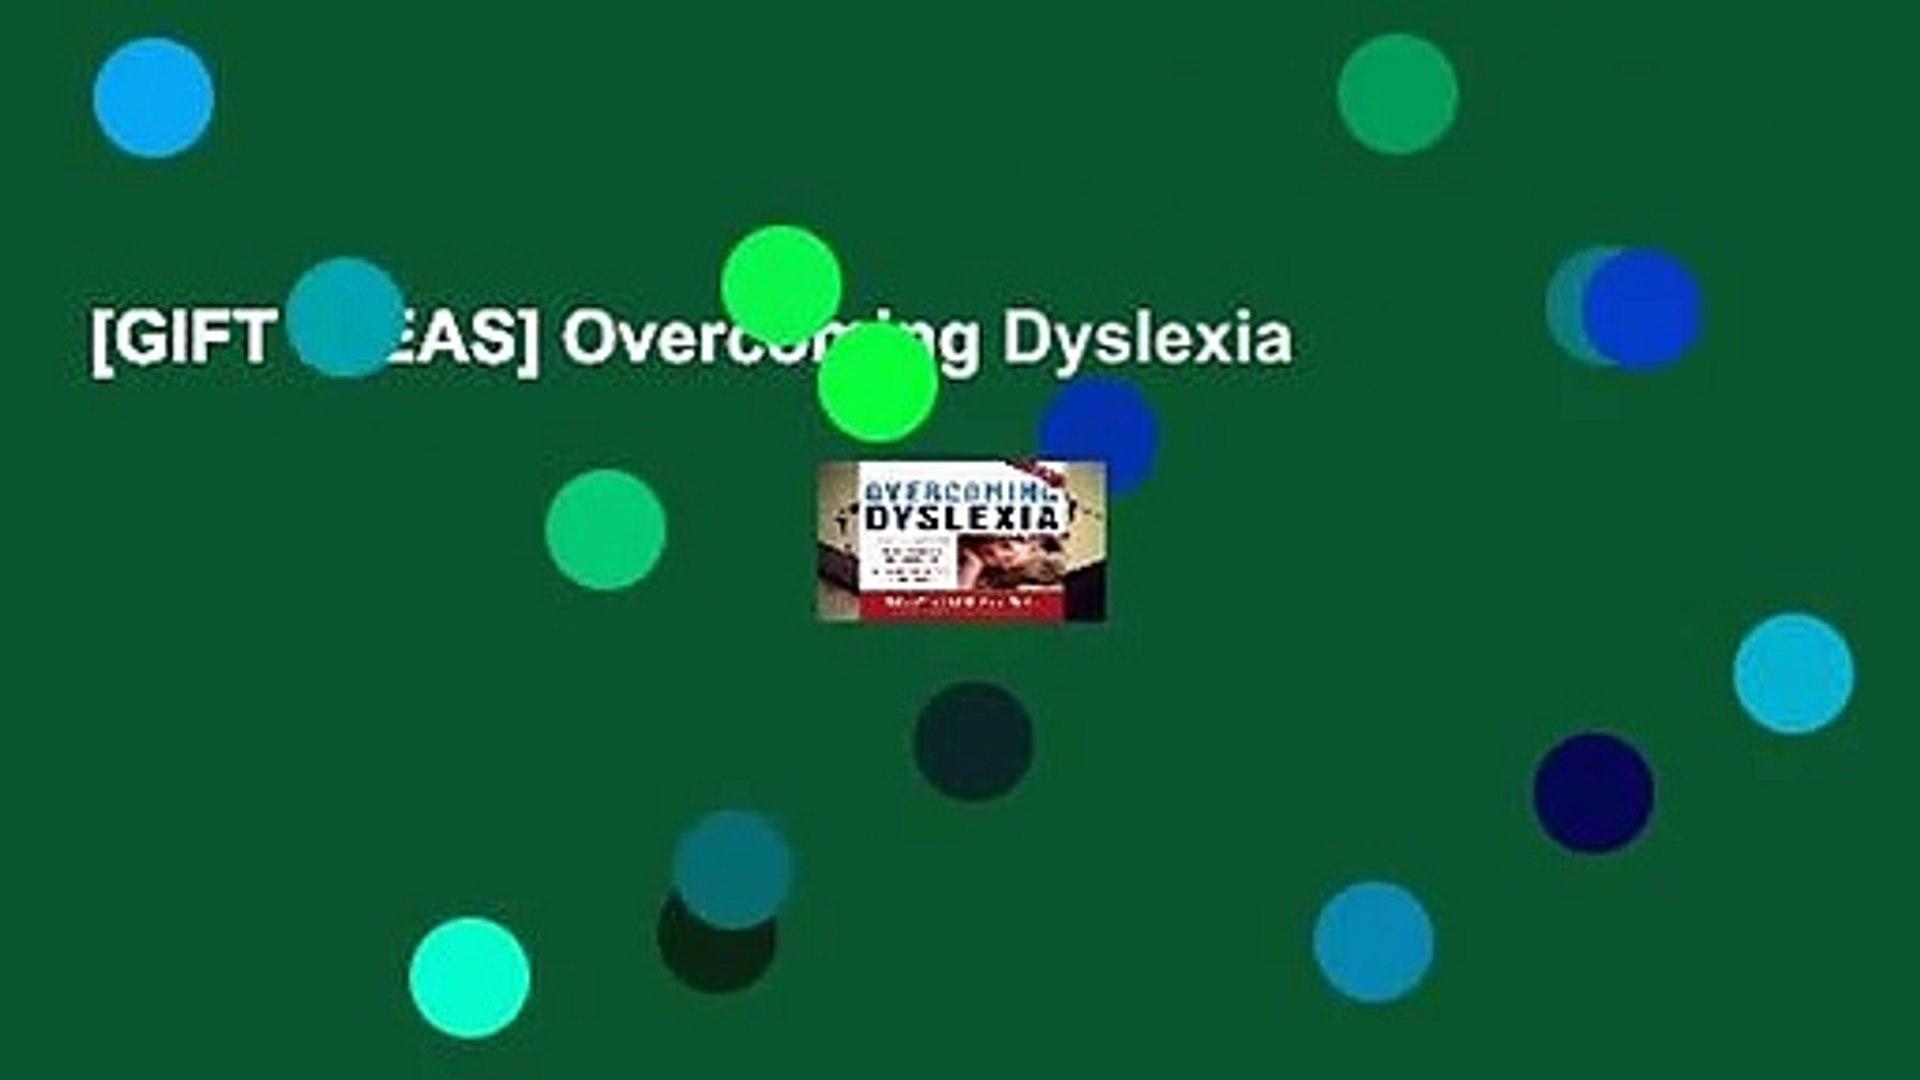 Understanding Dyslexia Dyslexia The Gift >> Gift Ideas Overcoming Dyslexia